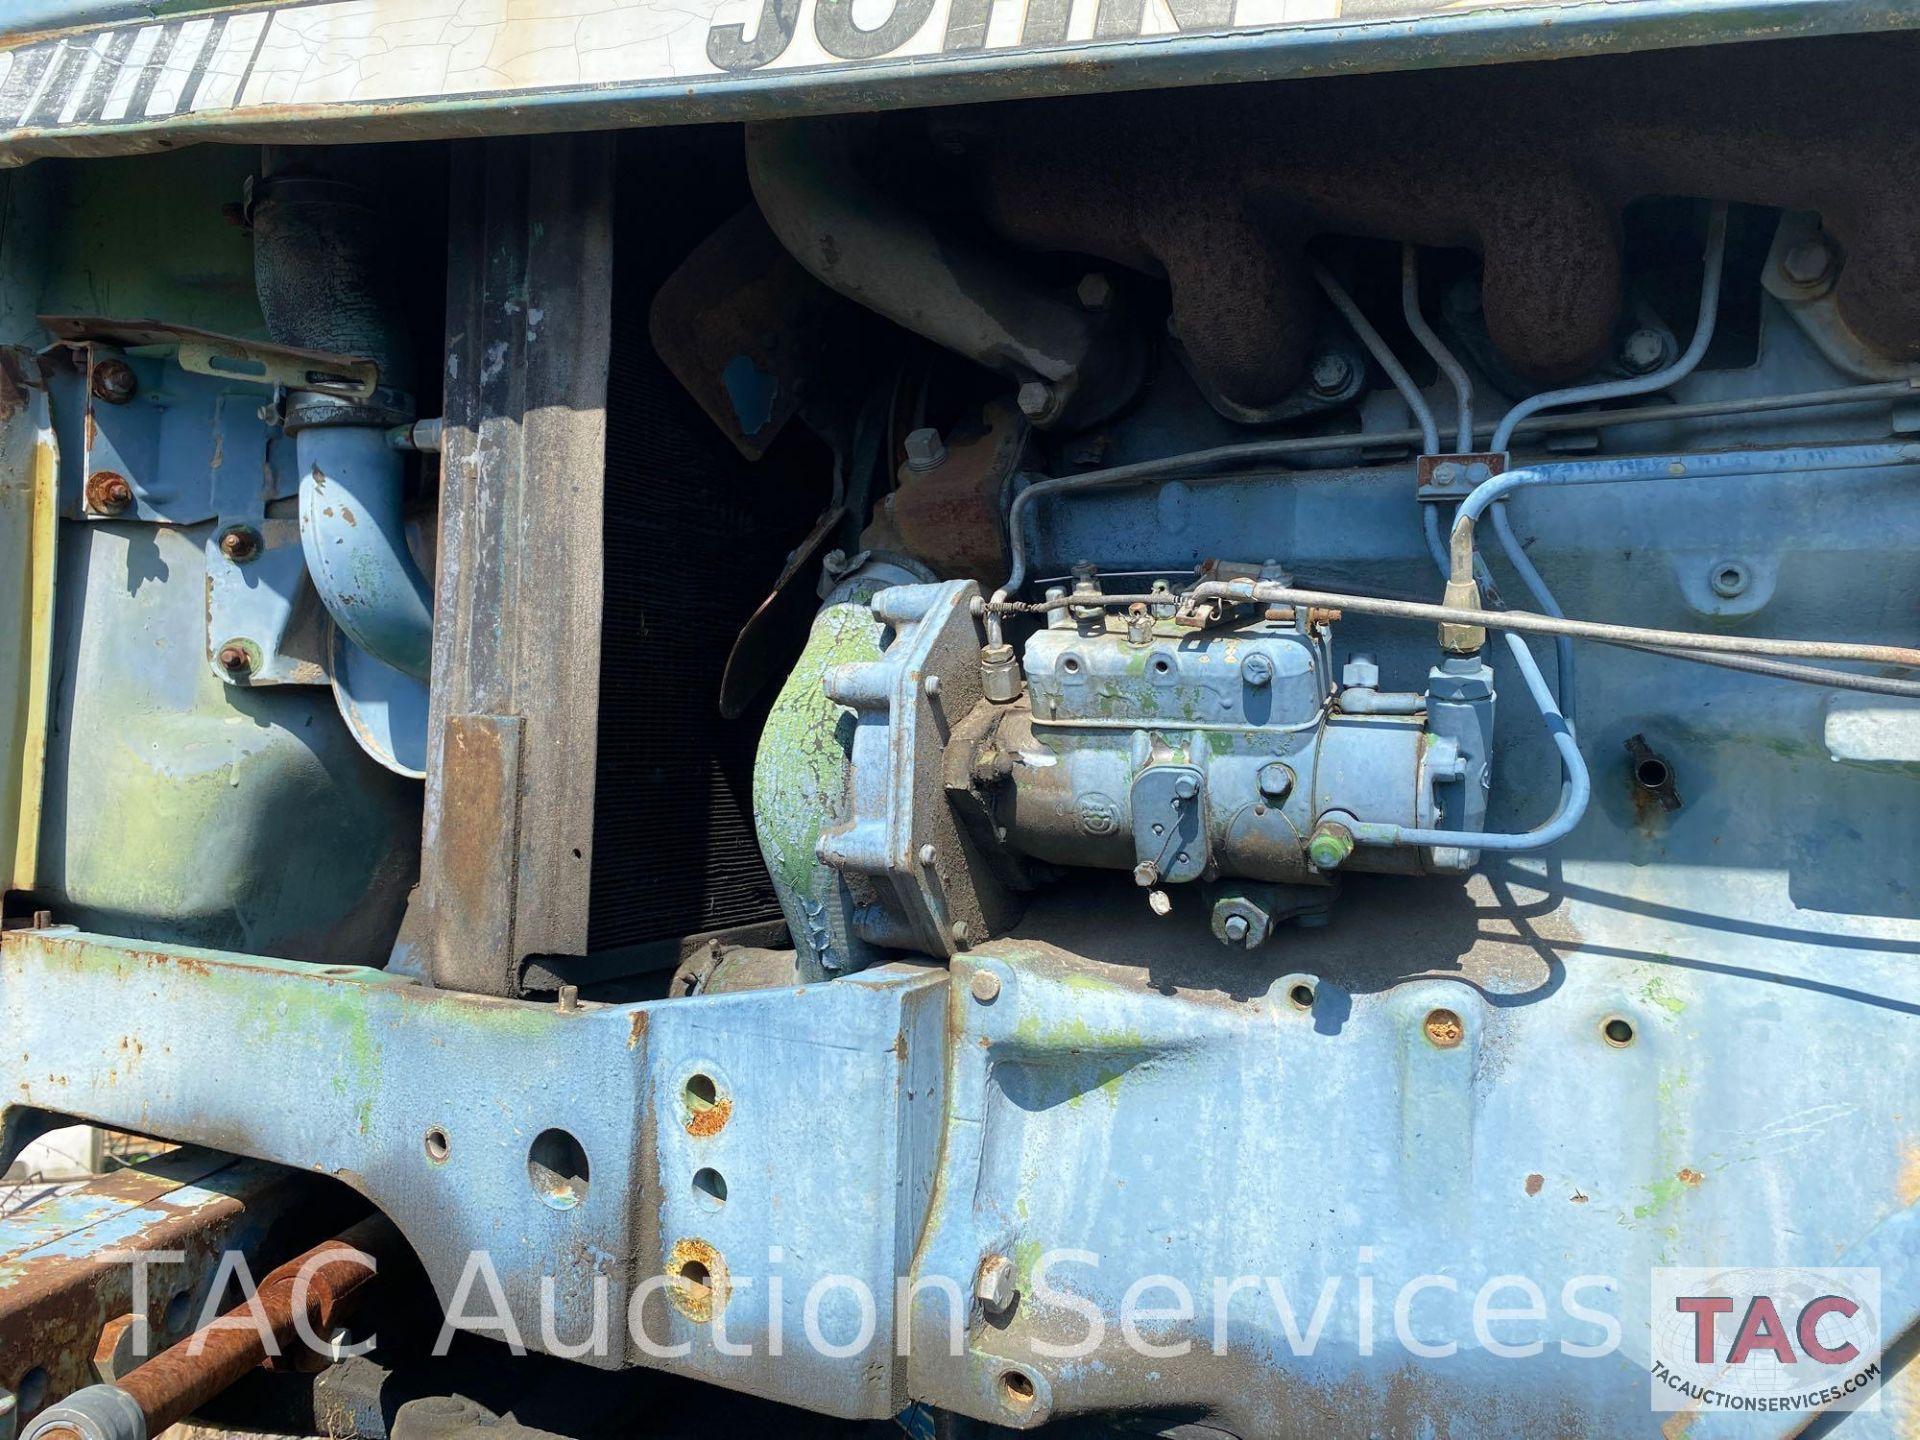 John Deere 2150 Farm Tractor - Image 13 of 34